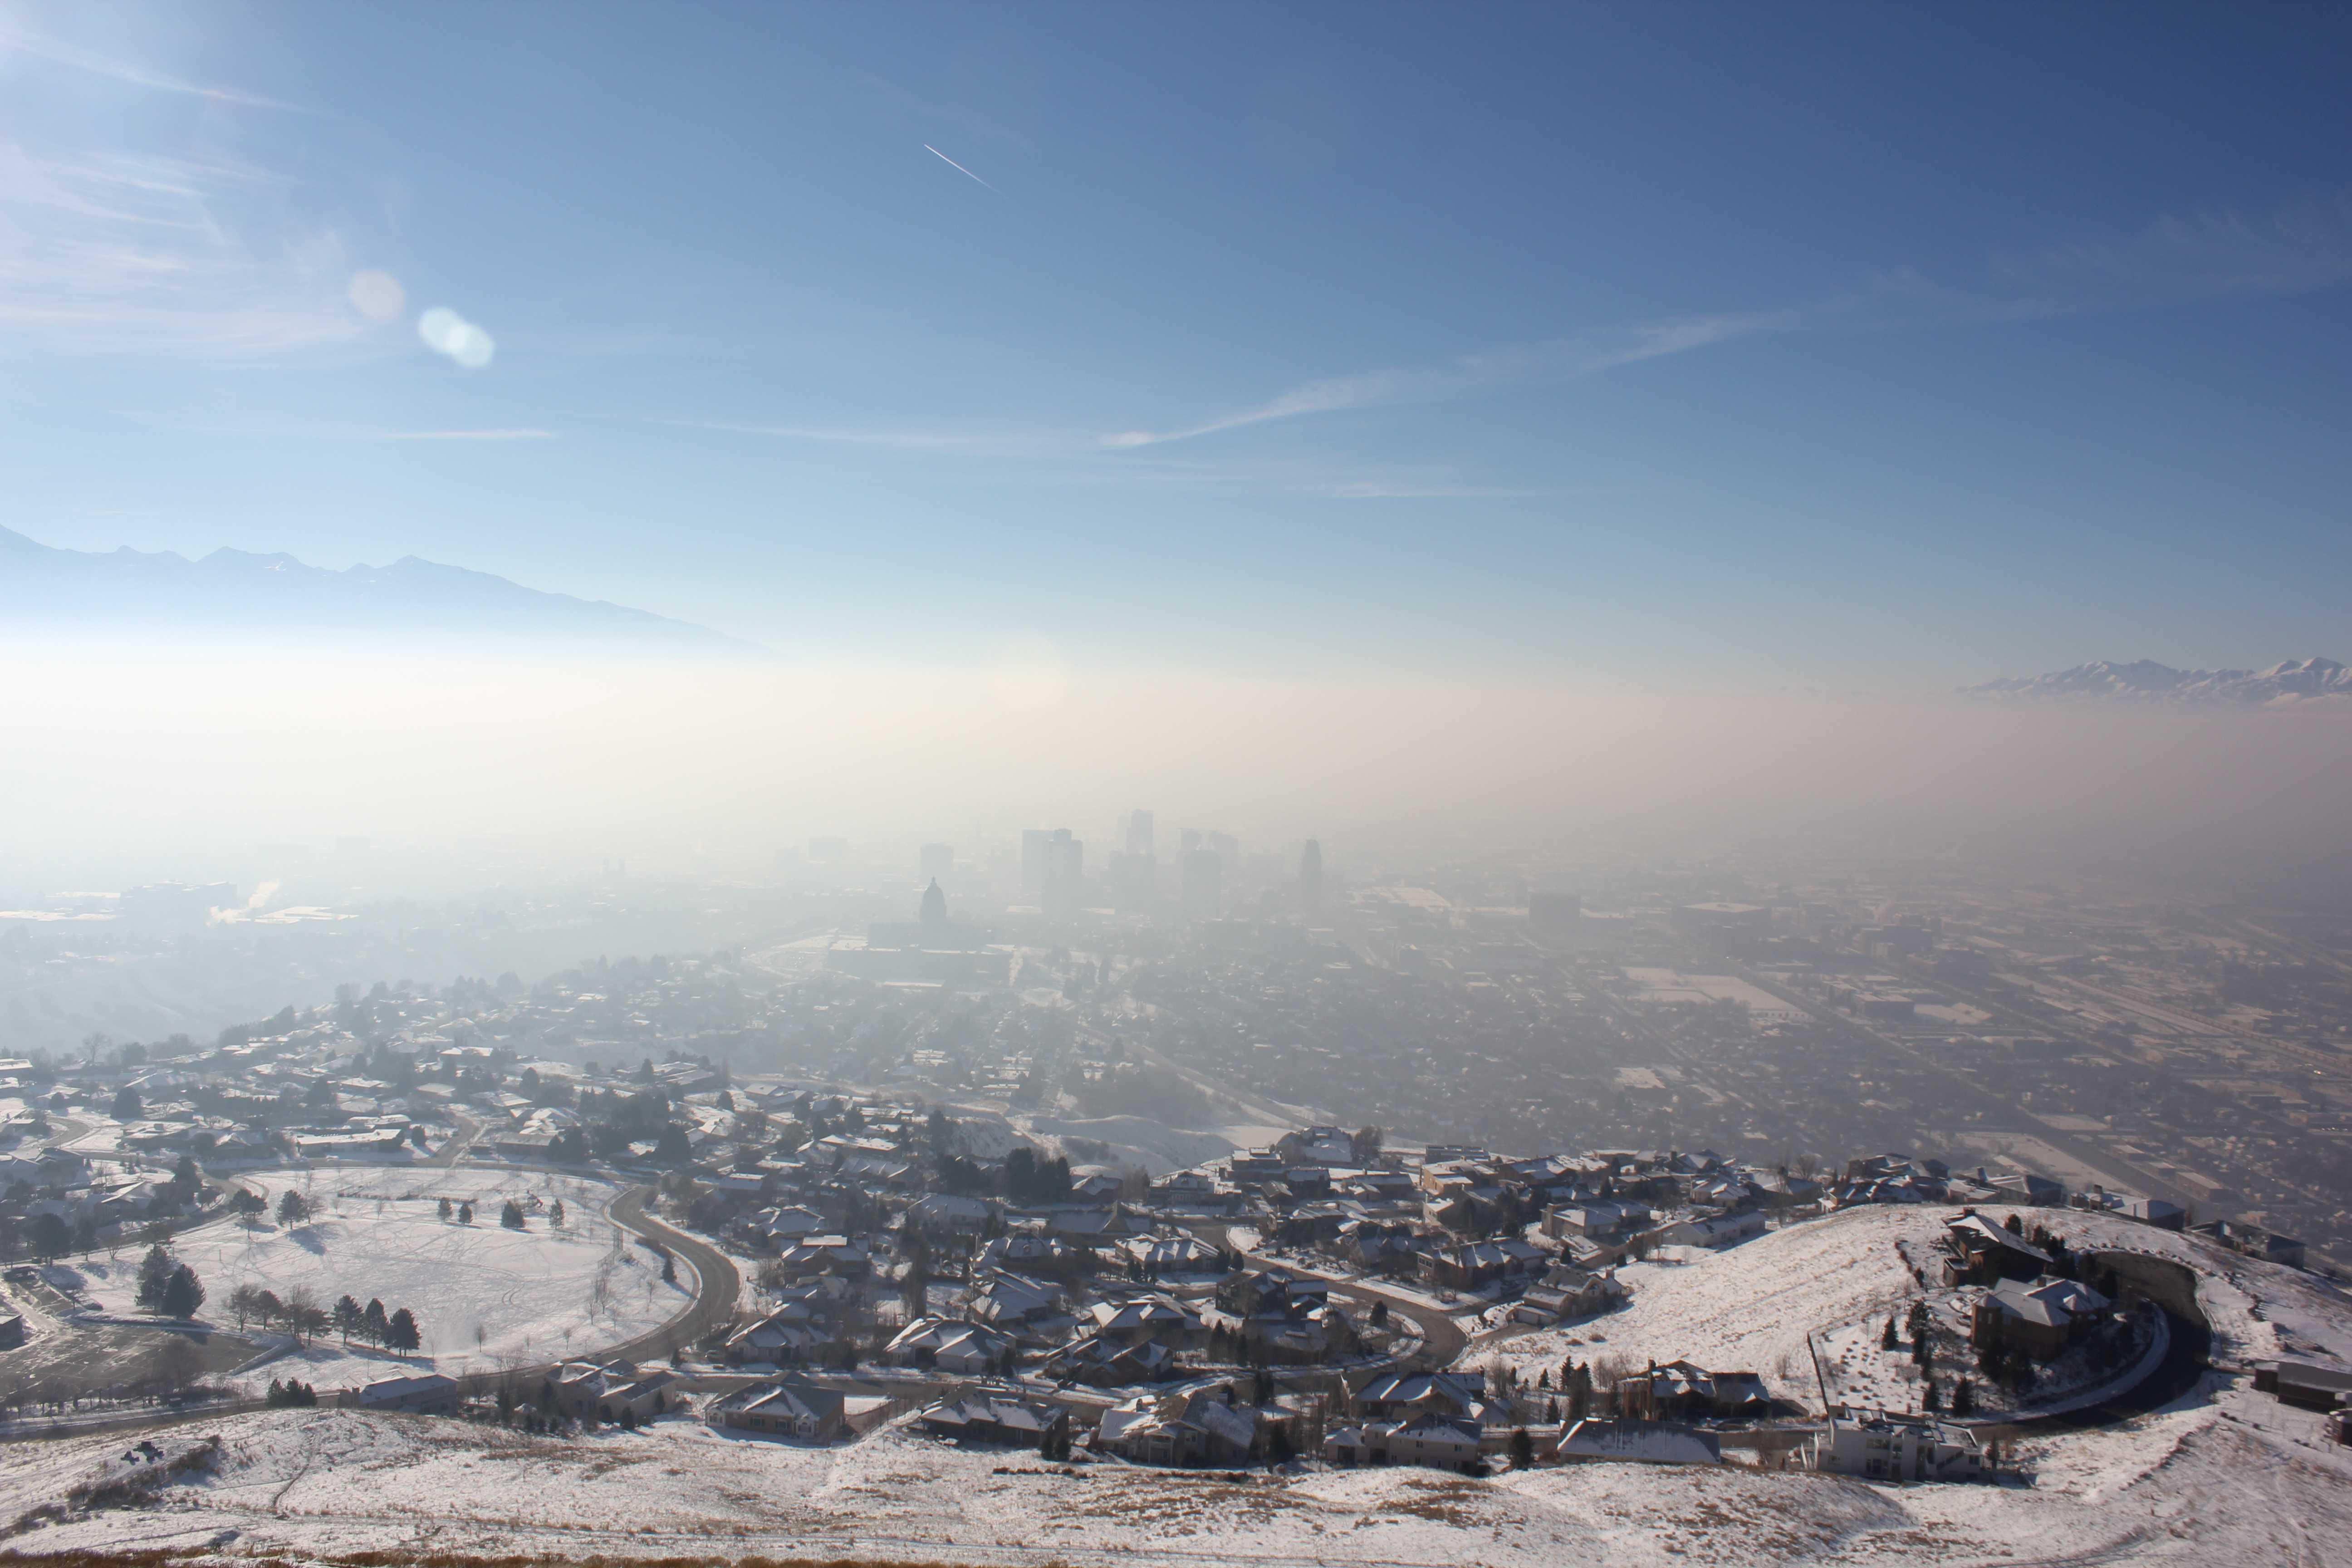 Smog over the Salt Lake Valley. Courtesy Flickr.